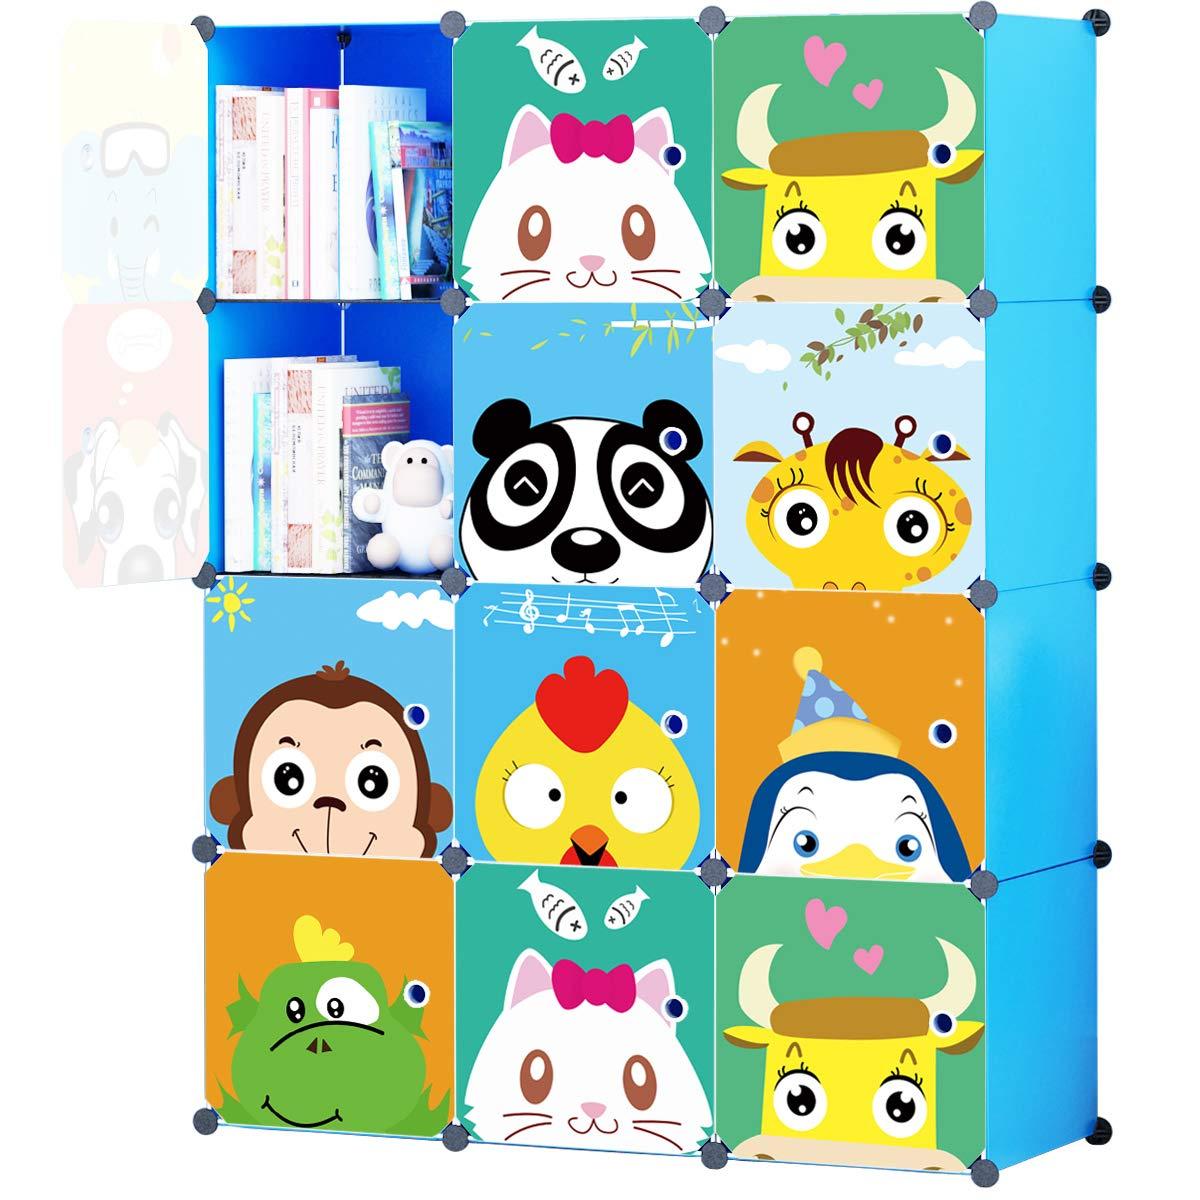 KOUSI Portable Kids Bookshelf Children Toy Organizer Multifuncation Cube Storage Shelf Cabinet Bookcase, Capacious & Study, Blue:12 Cubes by KOUSI (Image #1)